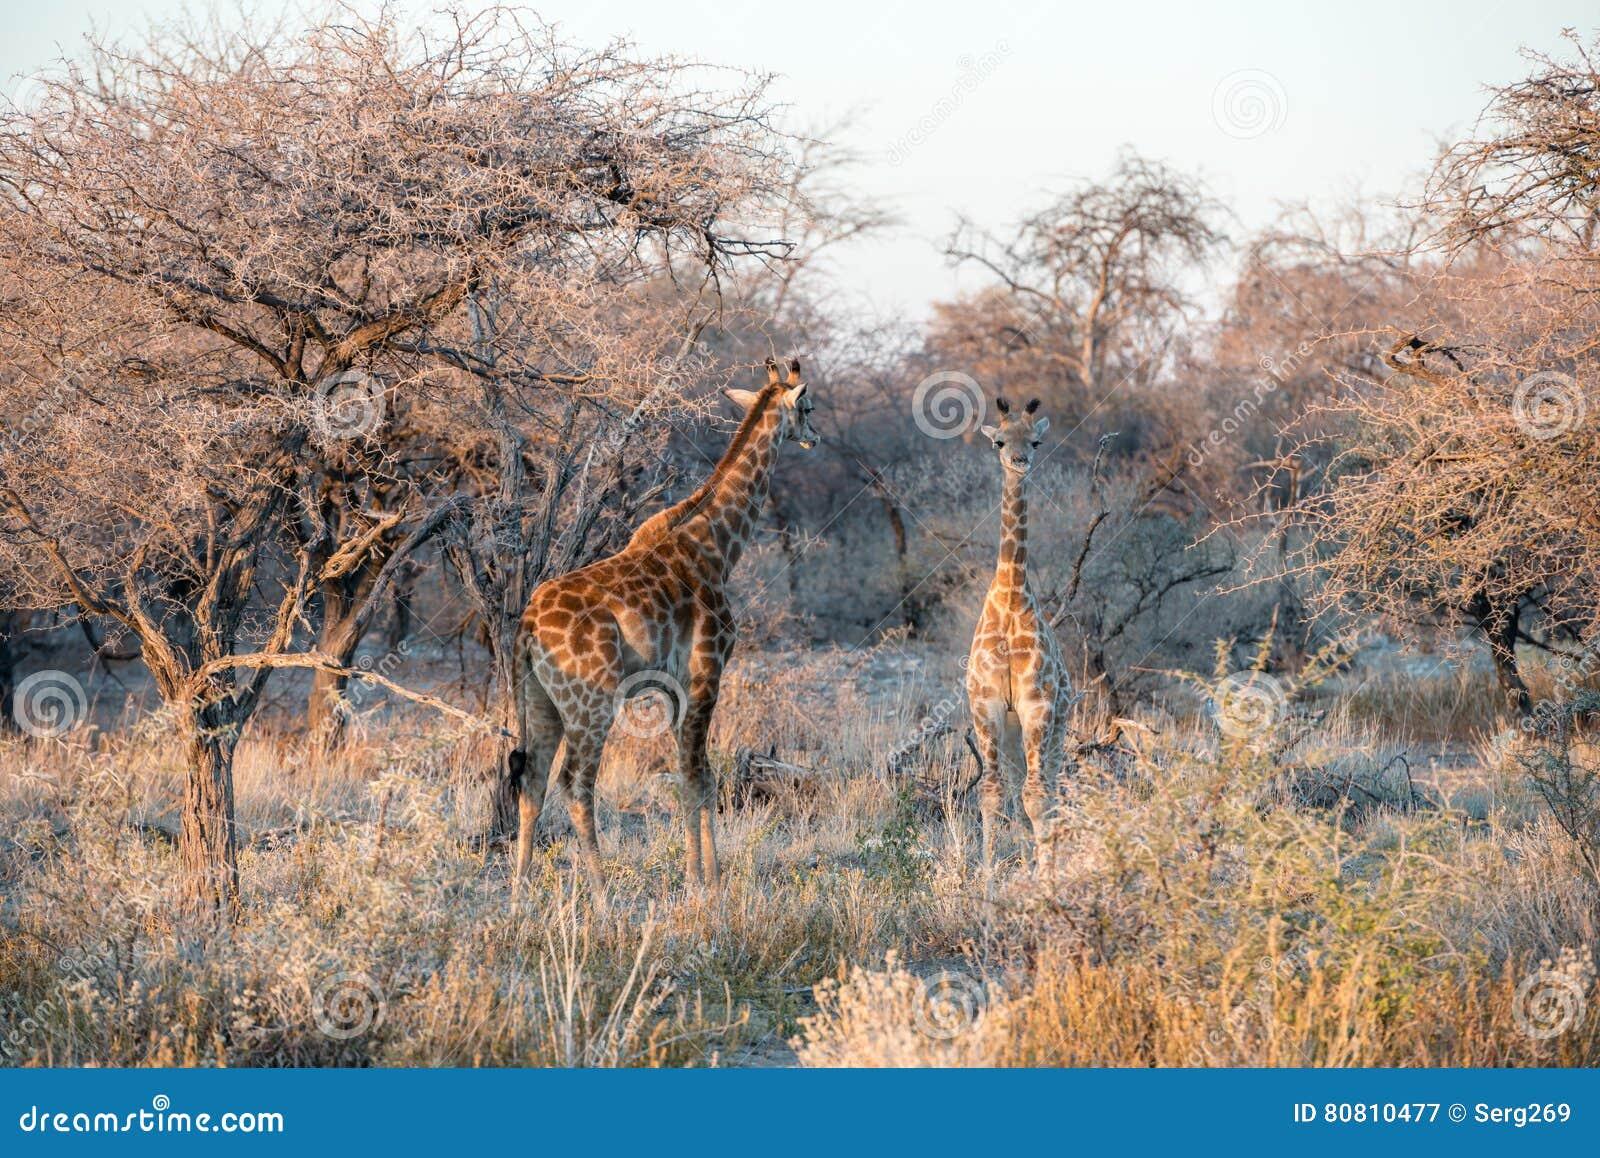 La jirafa namibiana divertida joven curiosamente está mirando en cámara